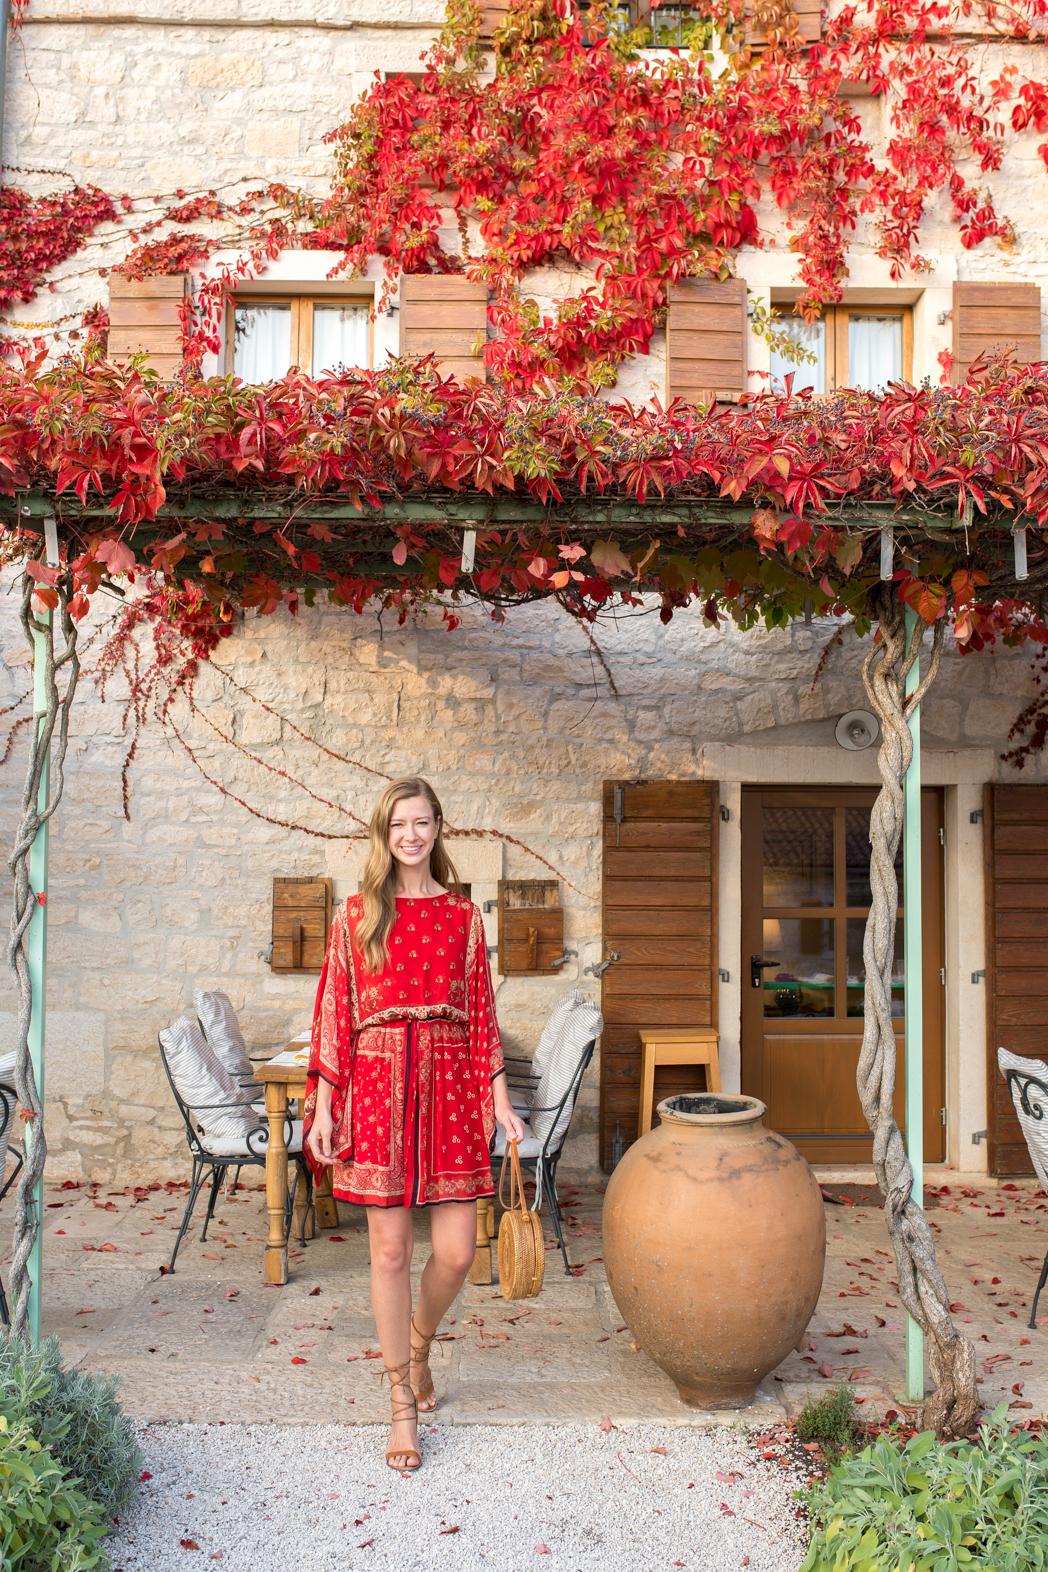 Stacie Flinner Meneghetti Relais Chateau-26.jpg